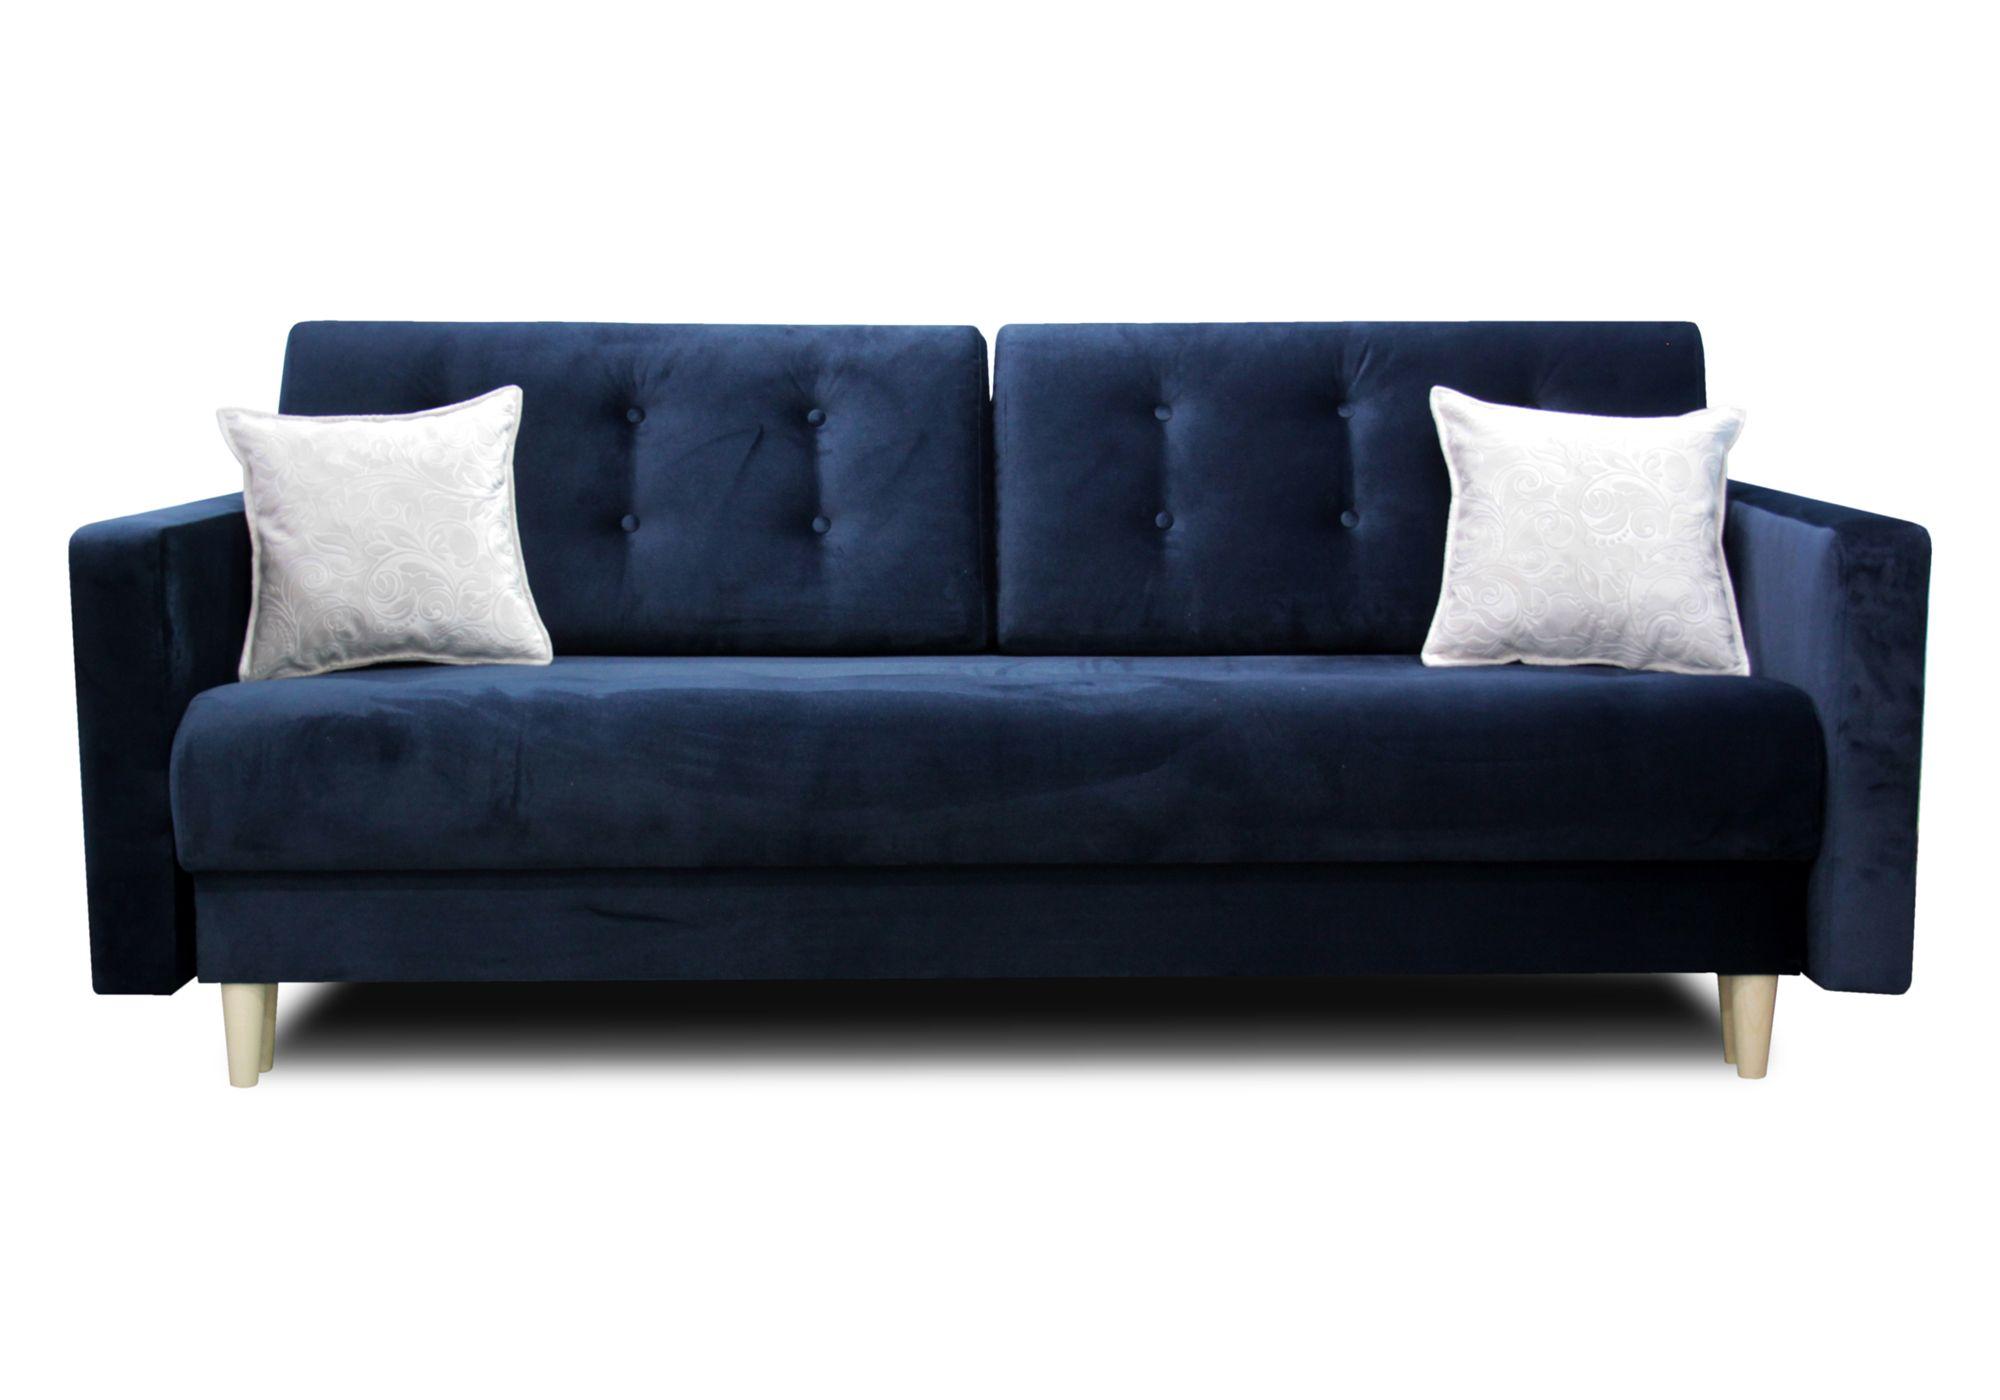 Granatowa Skandynawska Sofa Kanapa Rozkladana Oslo 7342256639 Oficjalne Archiwum Allegro Sofa Furniture Home Decor